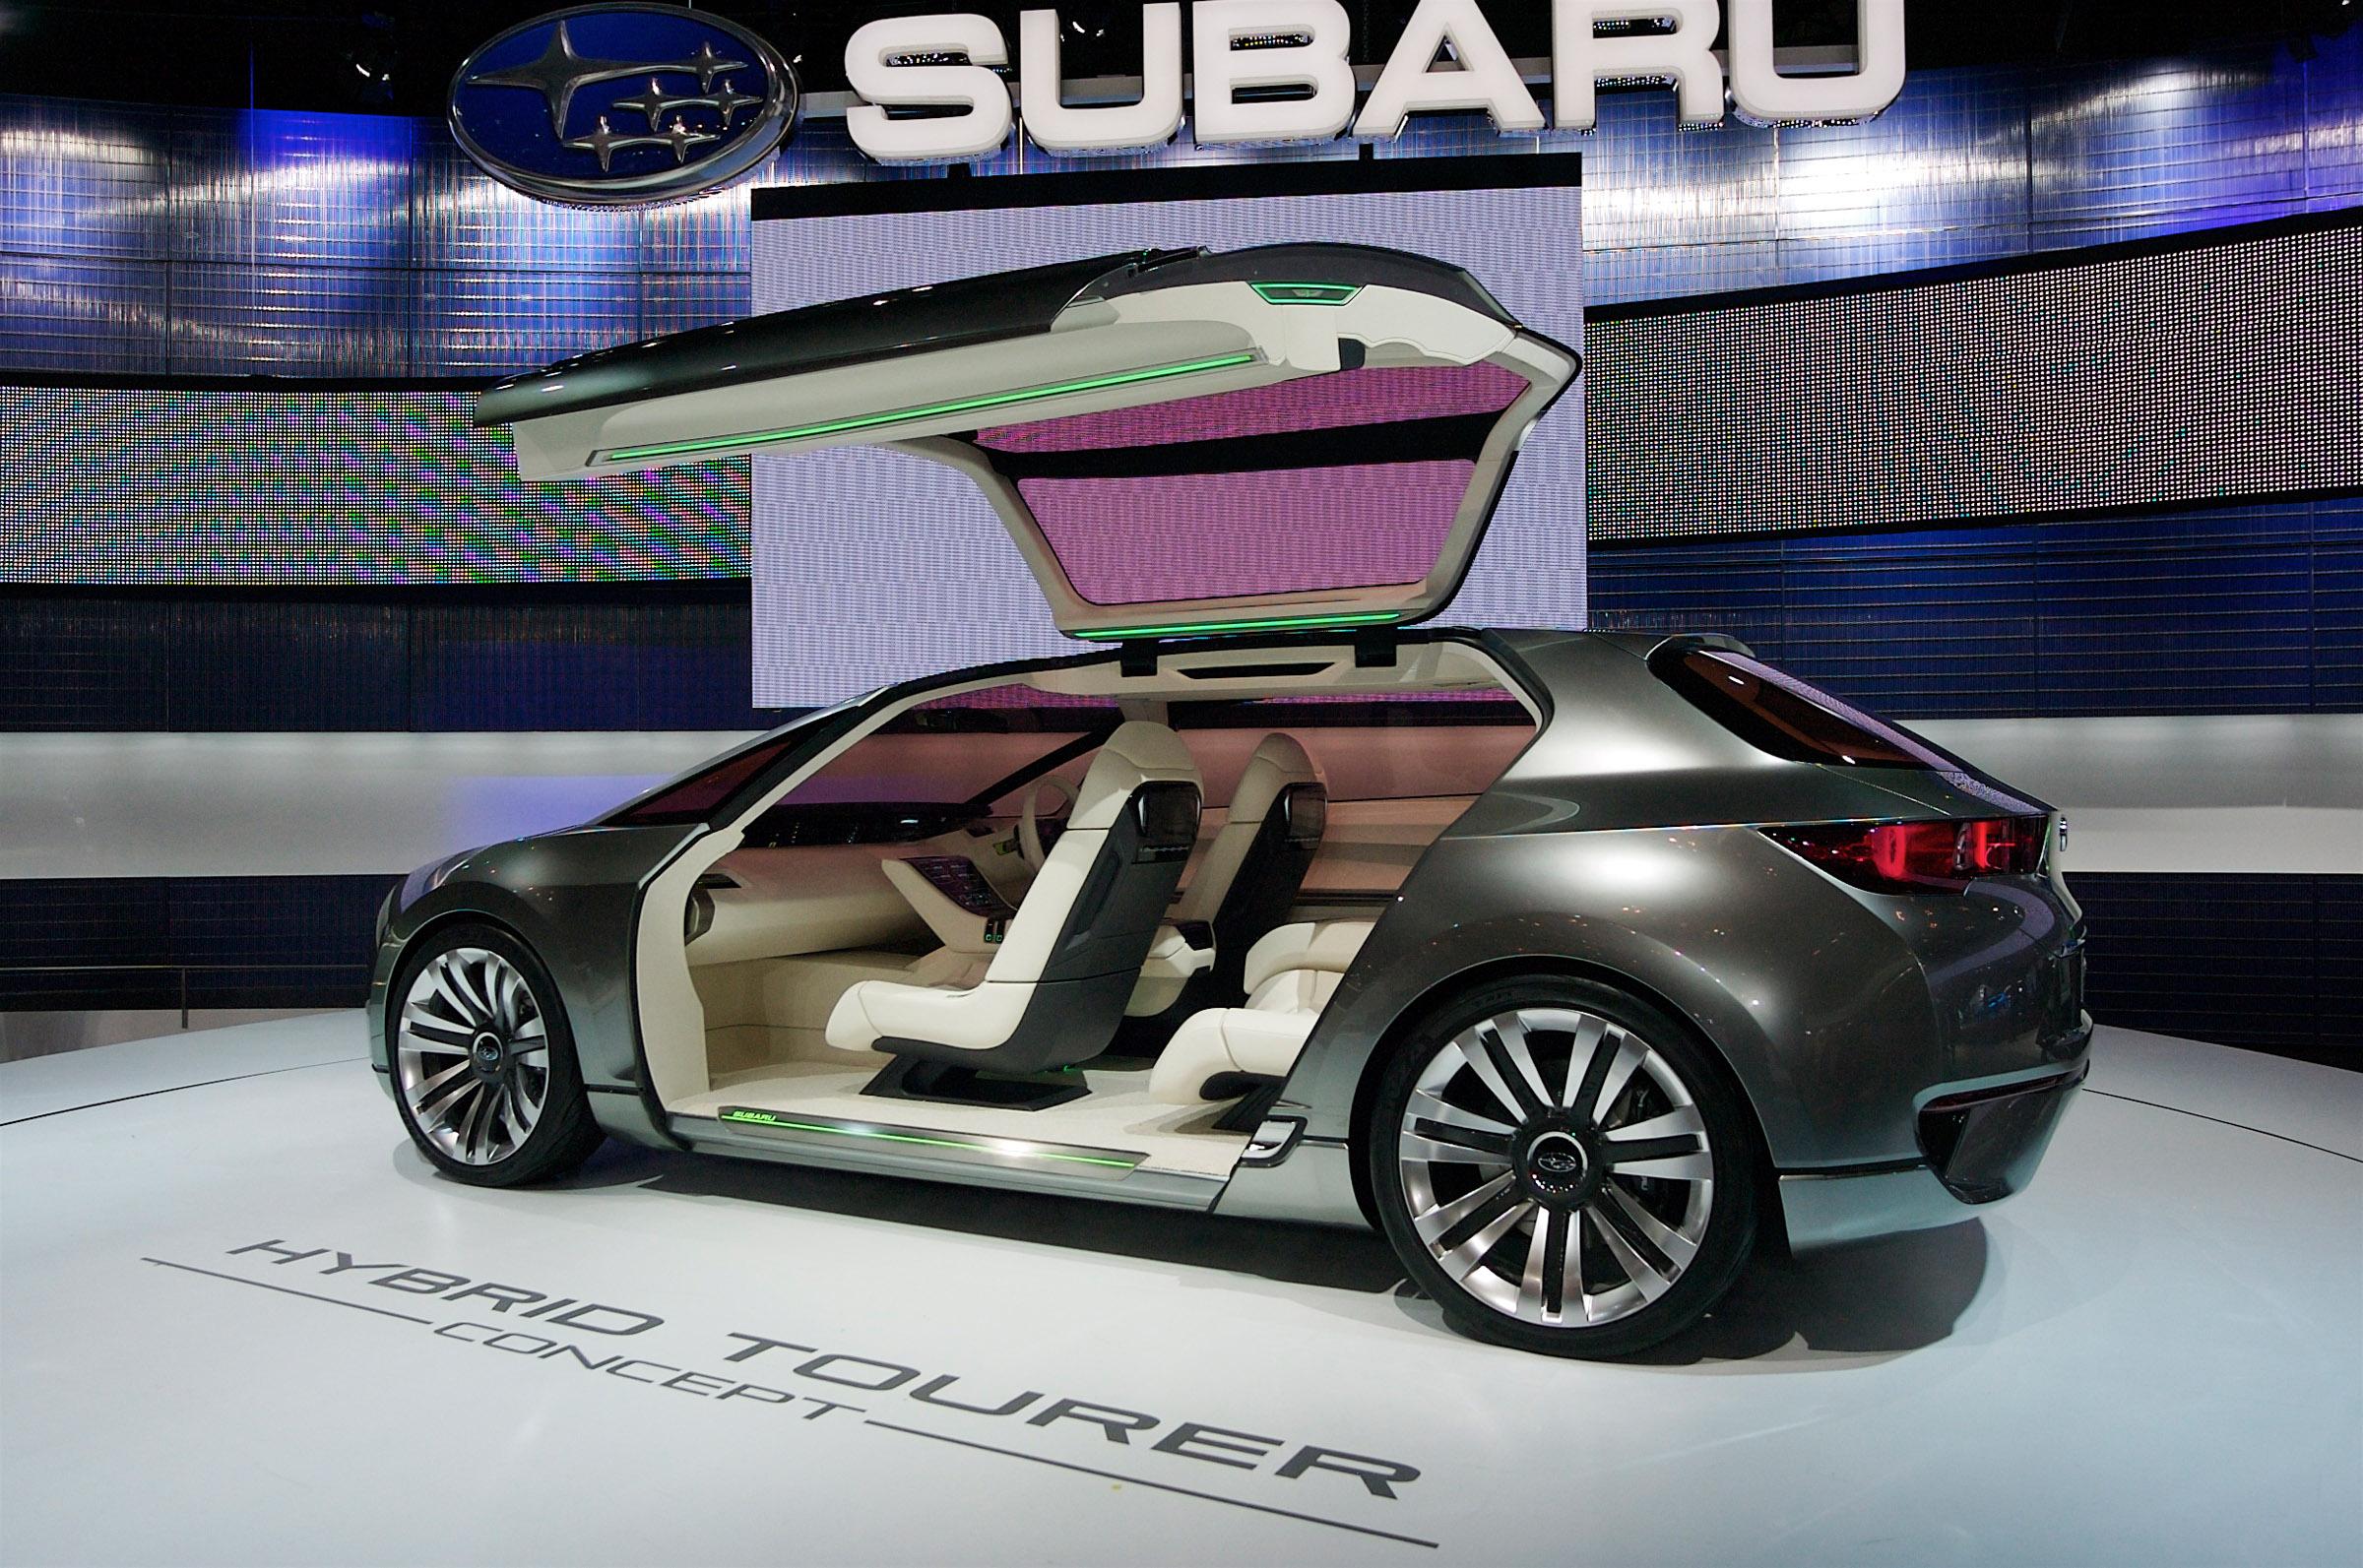 Subaru Hybrid Tourer Concept представила на Tokyo Motor show 2009 - фотография №8